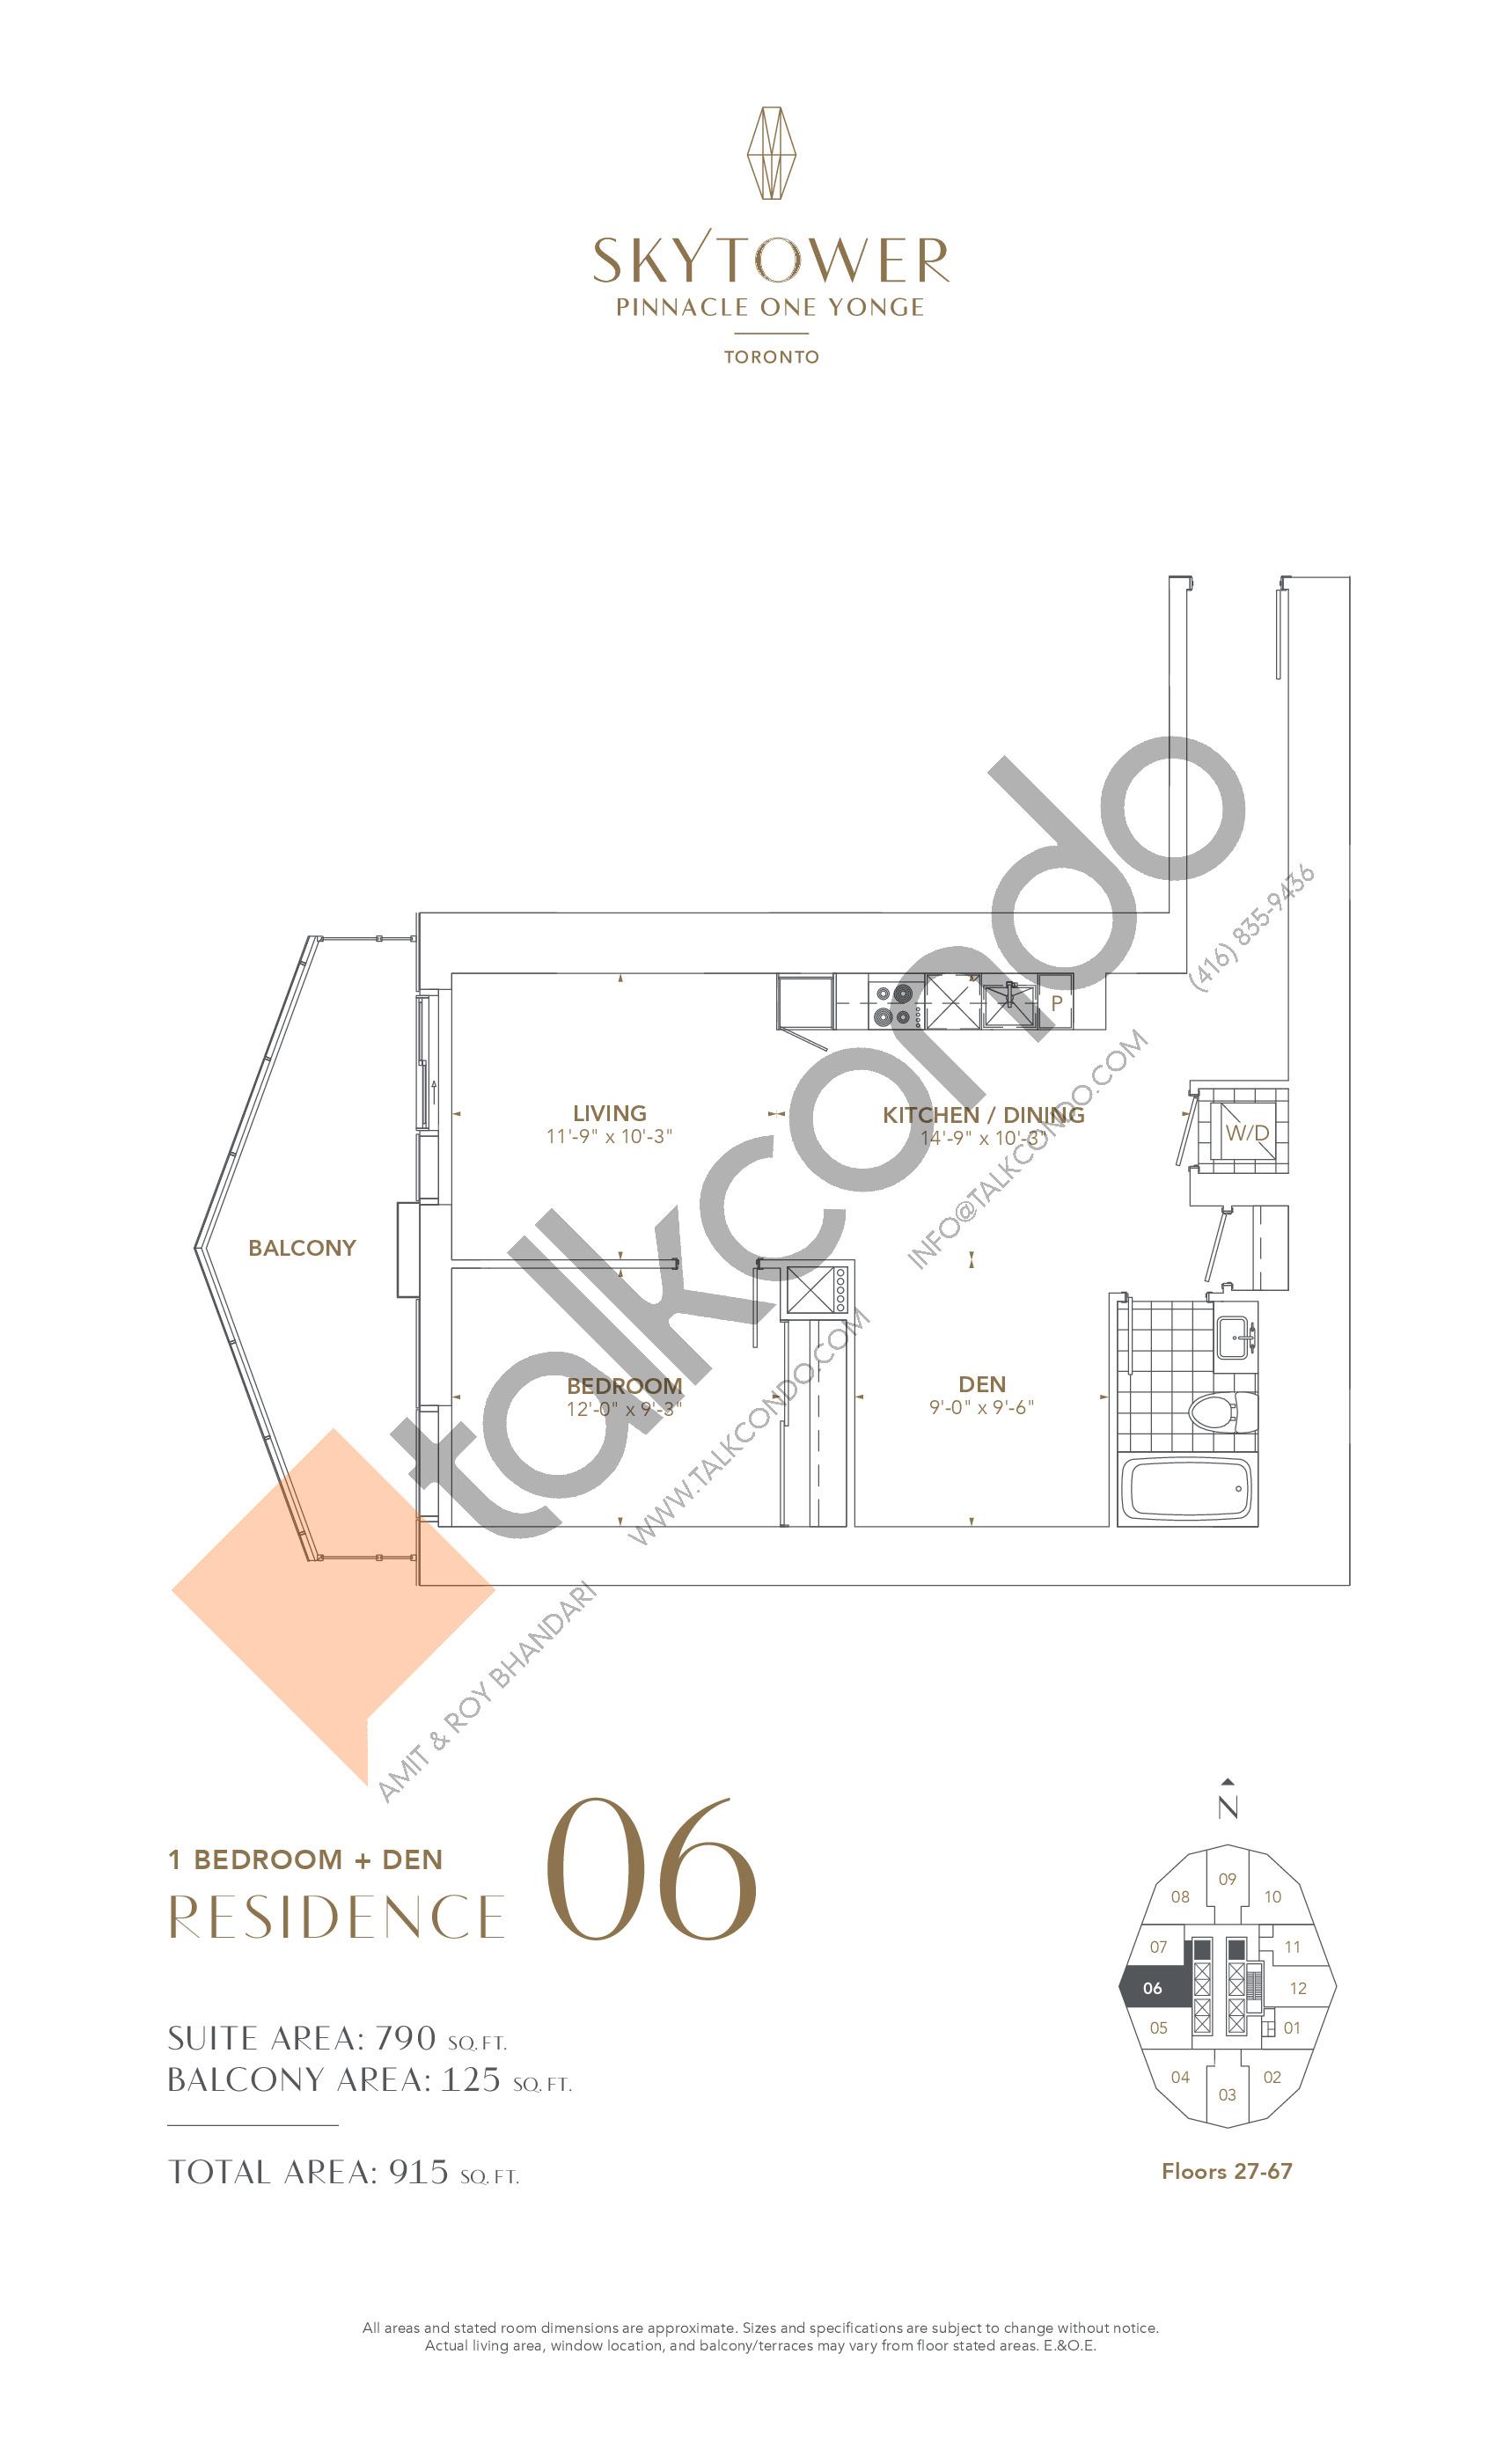 Residence 06 Floor Plan at SkyTower at Pinnacle One Yonge - 790 sq.ft